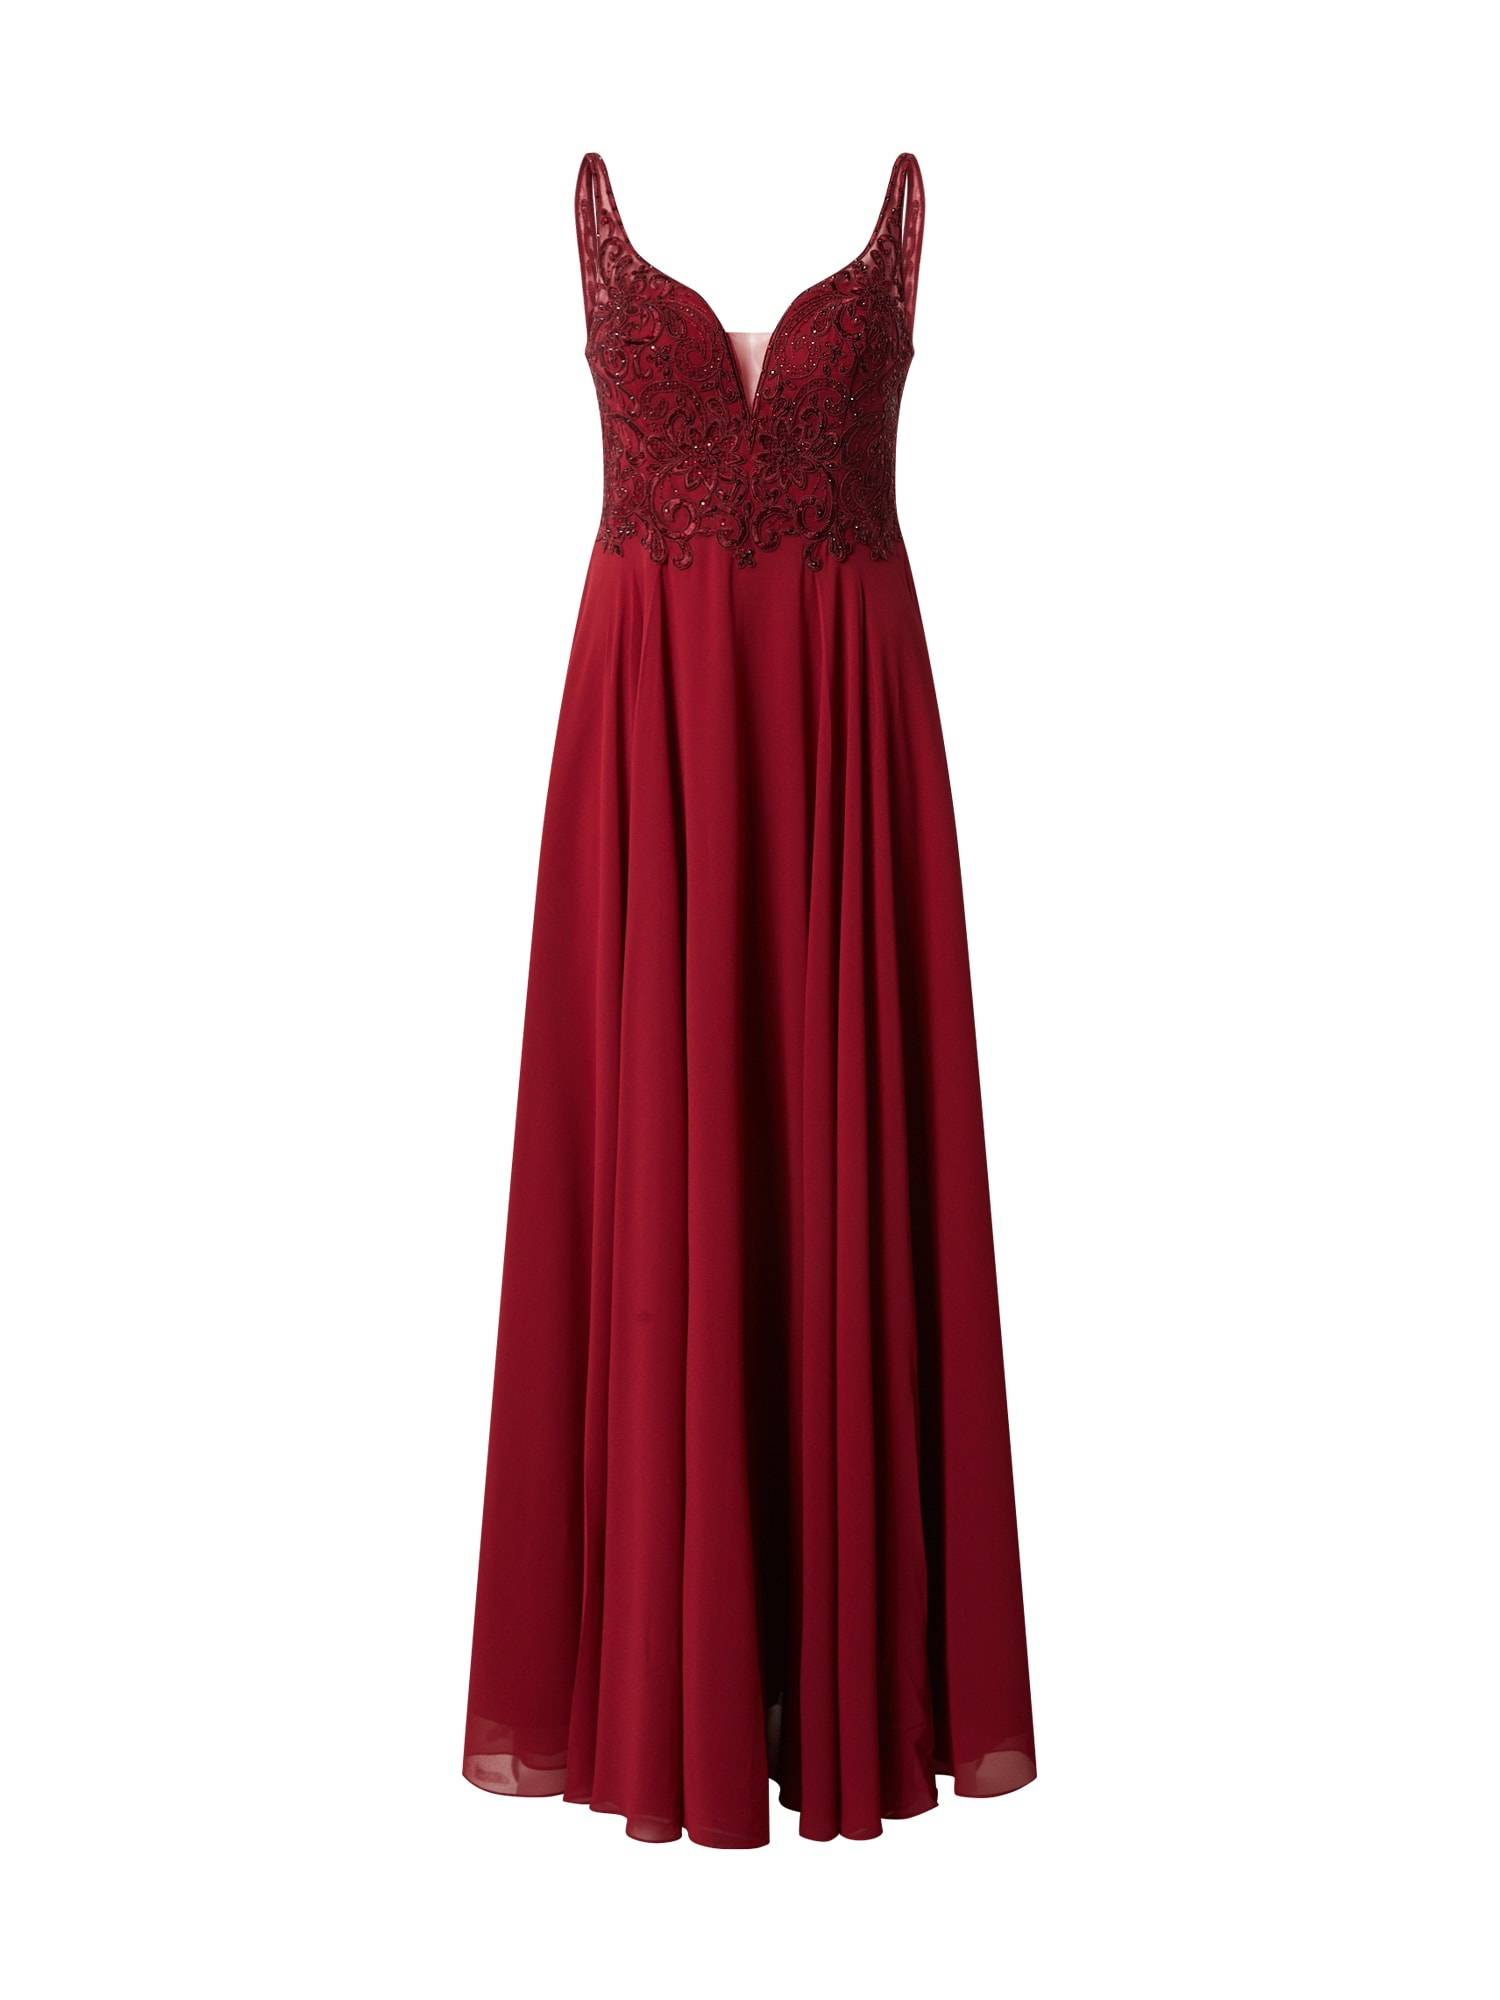 mascara Robe de soirée 'MC181487'  - Rouge - Taille: 36 - female